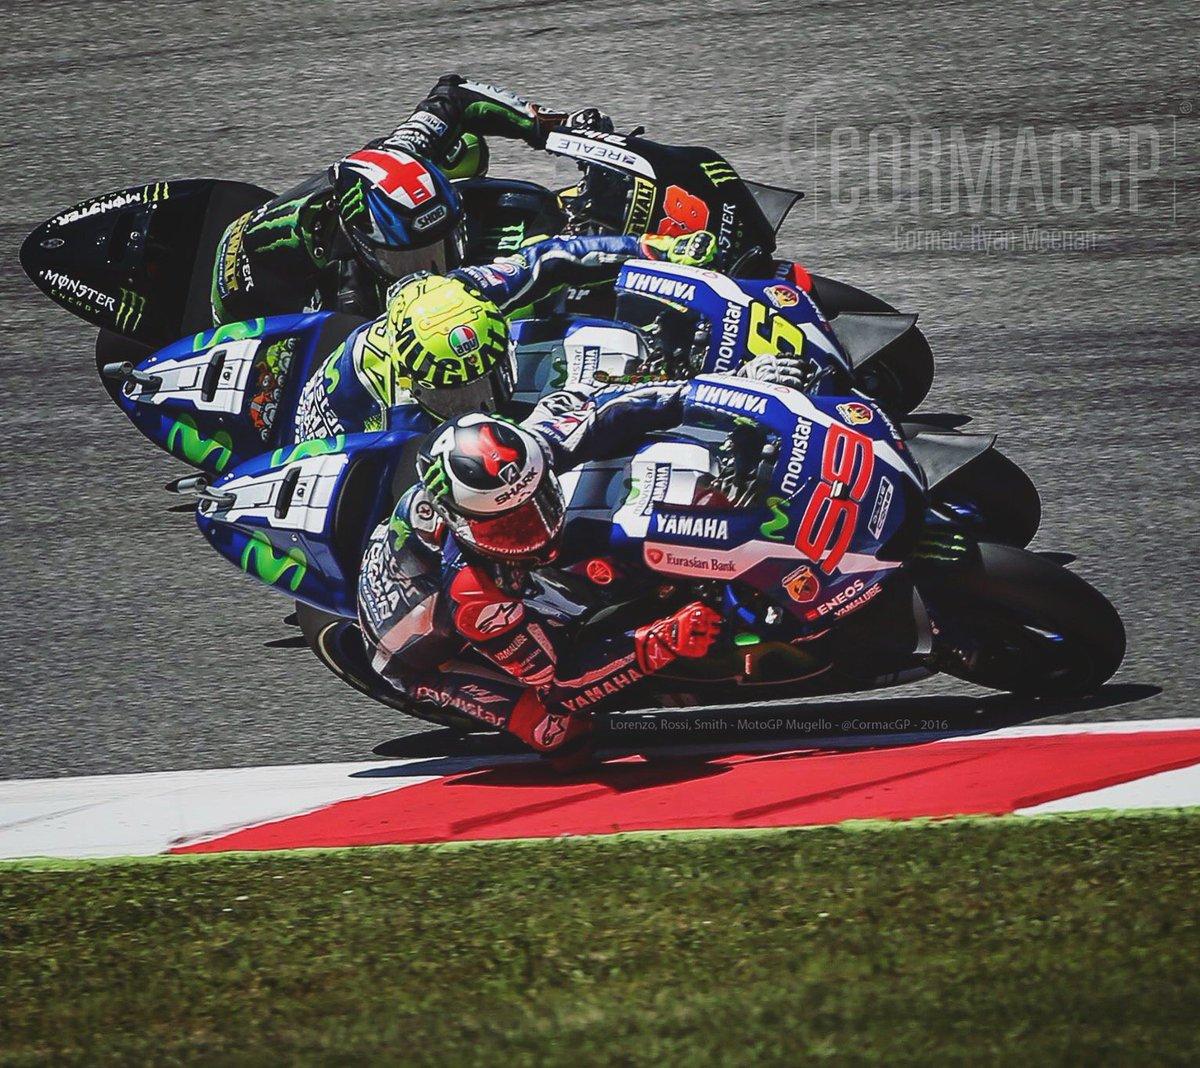 Mugello @MotoGP ! @lorenzo99, @ValeYellow46 & @BradleySmith38 this afternoon ! https://t.co/w443Gsl4ol